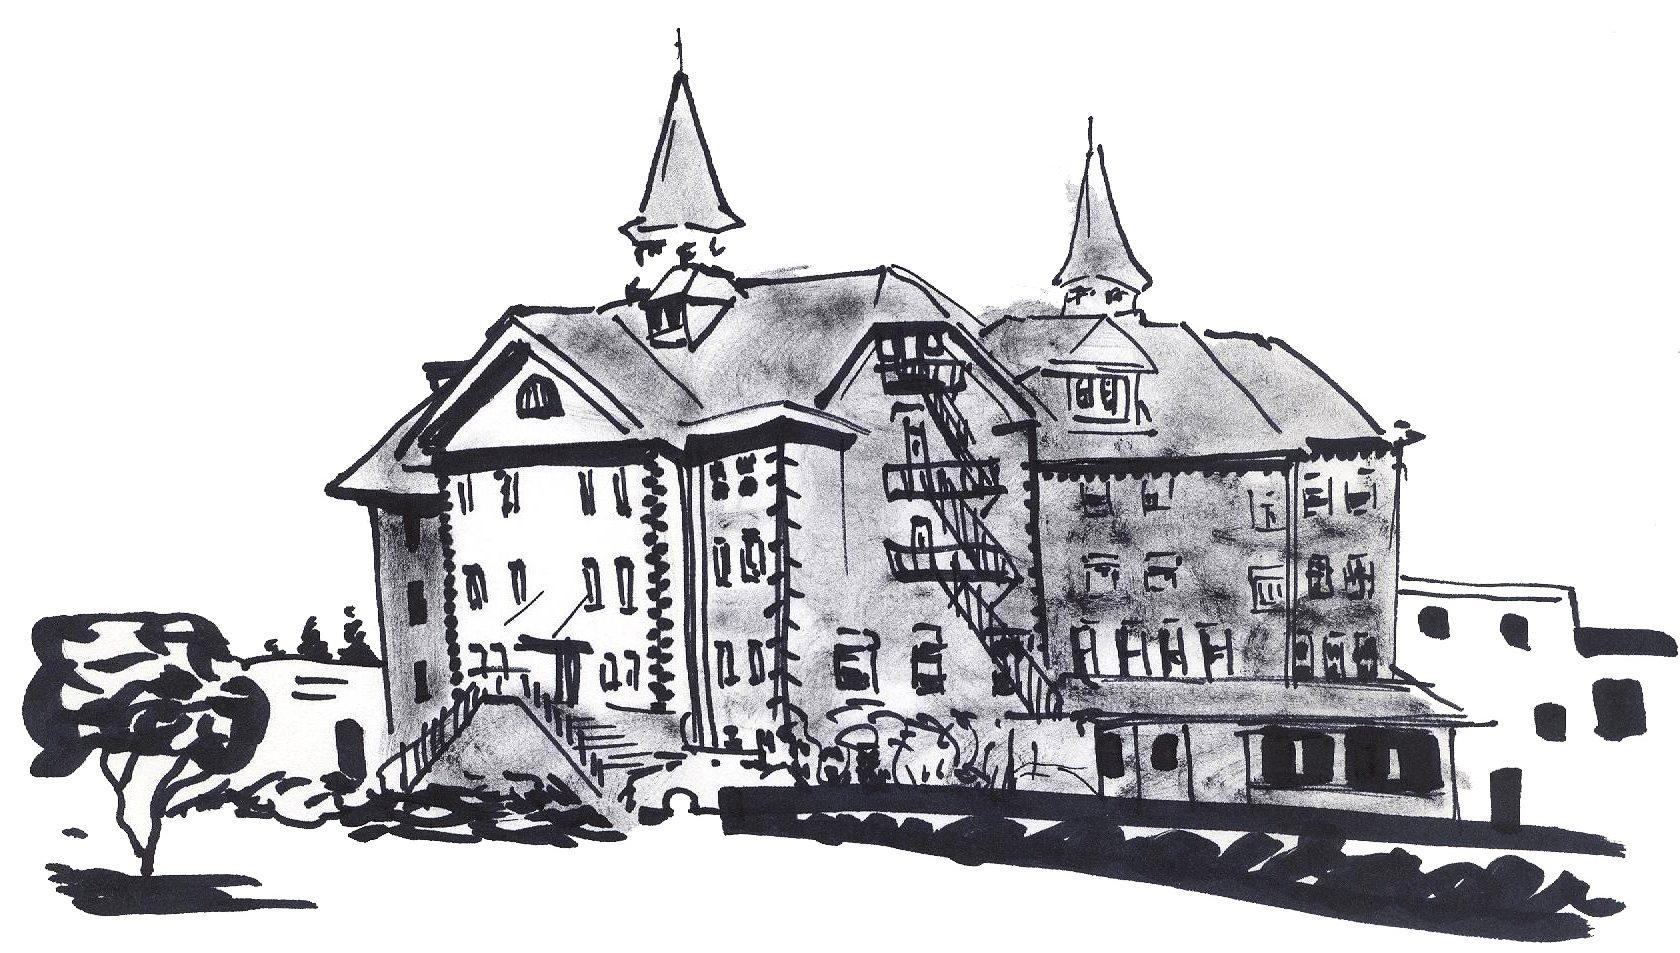 ink sketch olarge forbidding old institution